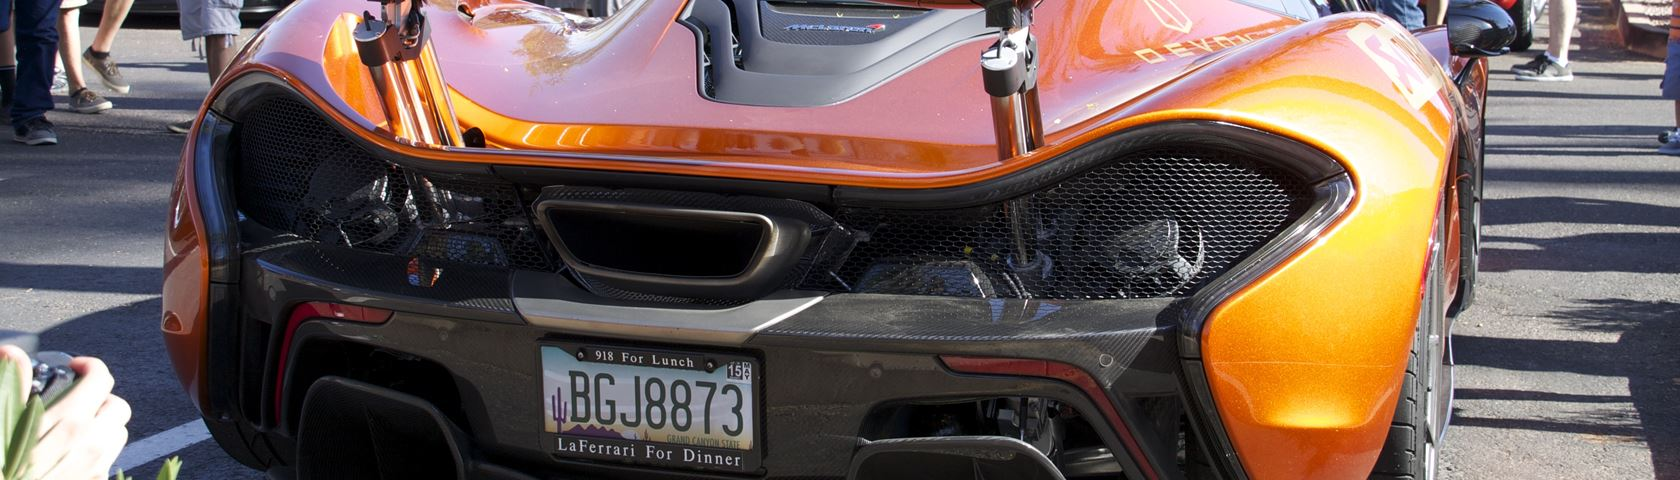 McLaren P1 Rear View (Porsche 918 for lunch, LaFerrari for dinner)